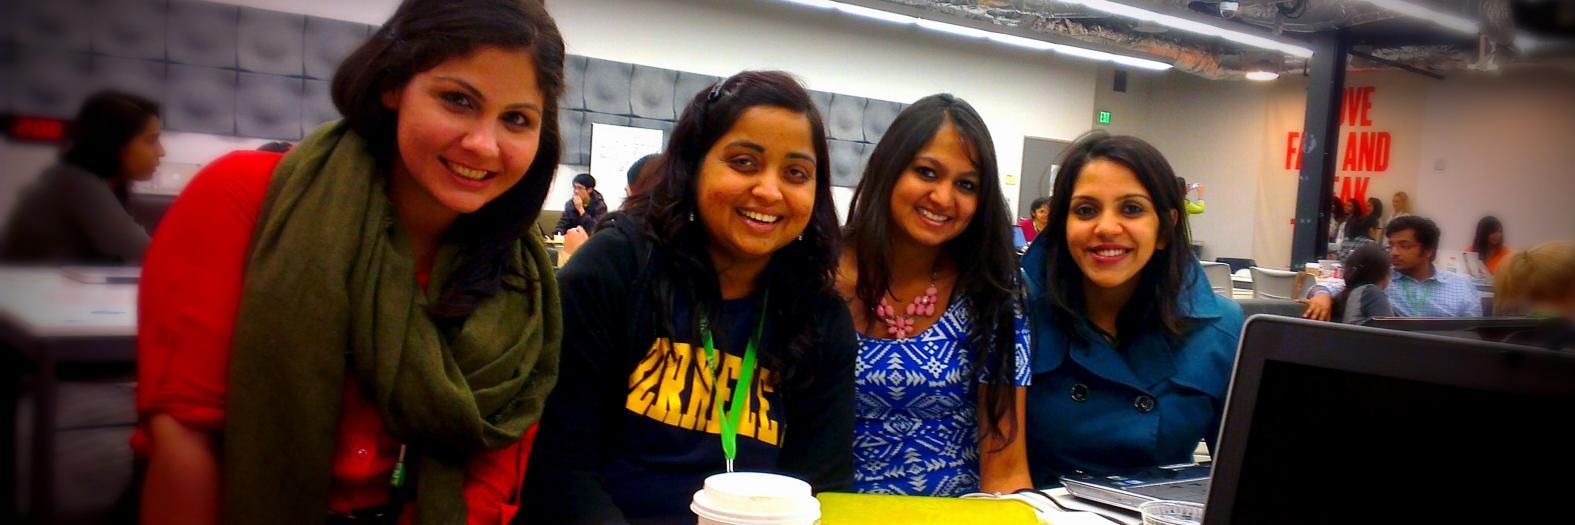 Arezu Aghaseyedjavadi, Ruchita Rathi, Ankita Bhosle, and Sufia Siddiqui (l to r).